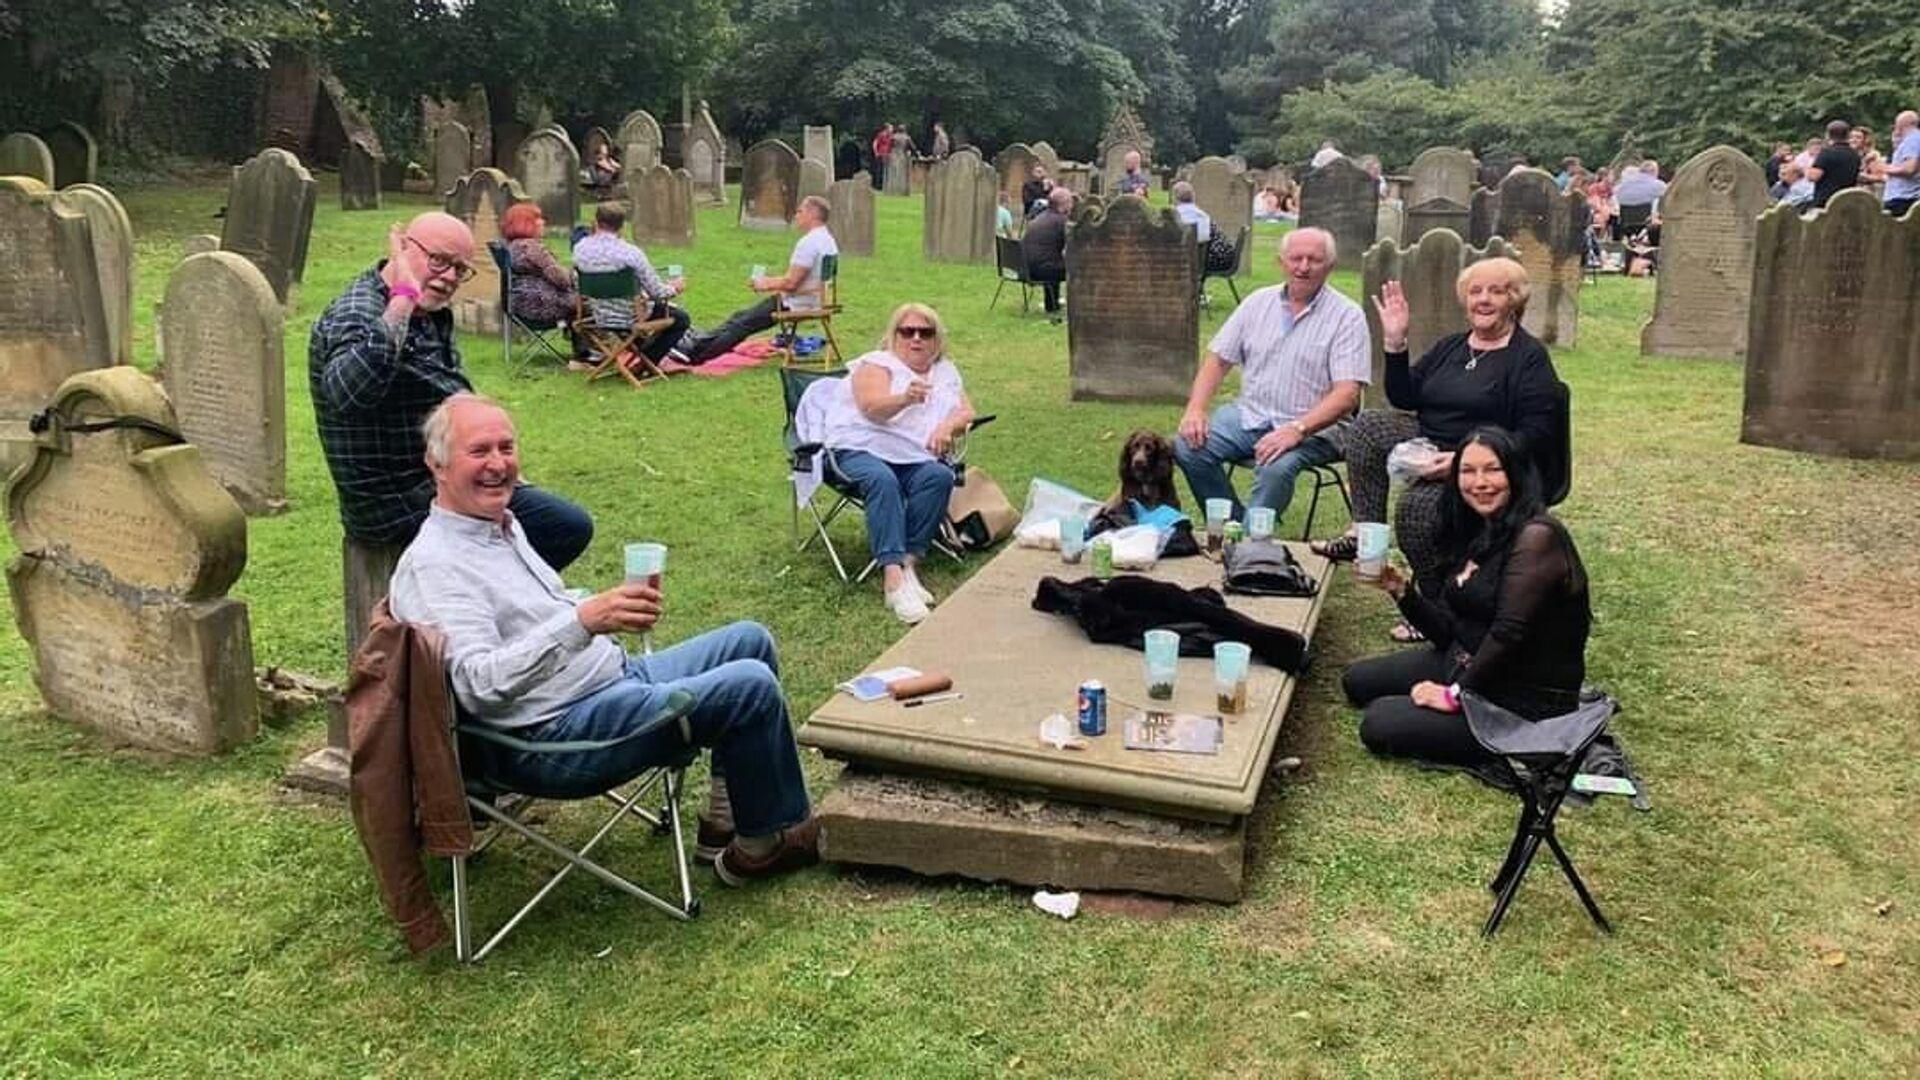 St. Mary's Church beer festival goers enjoy beverage in the church's graveyard. - Sputnik International, 1920, 27.09.2021